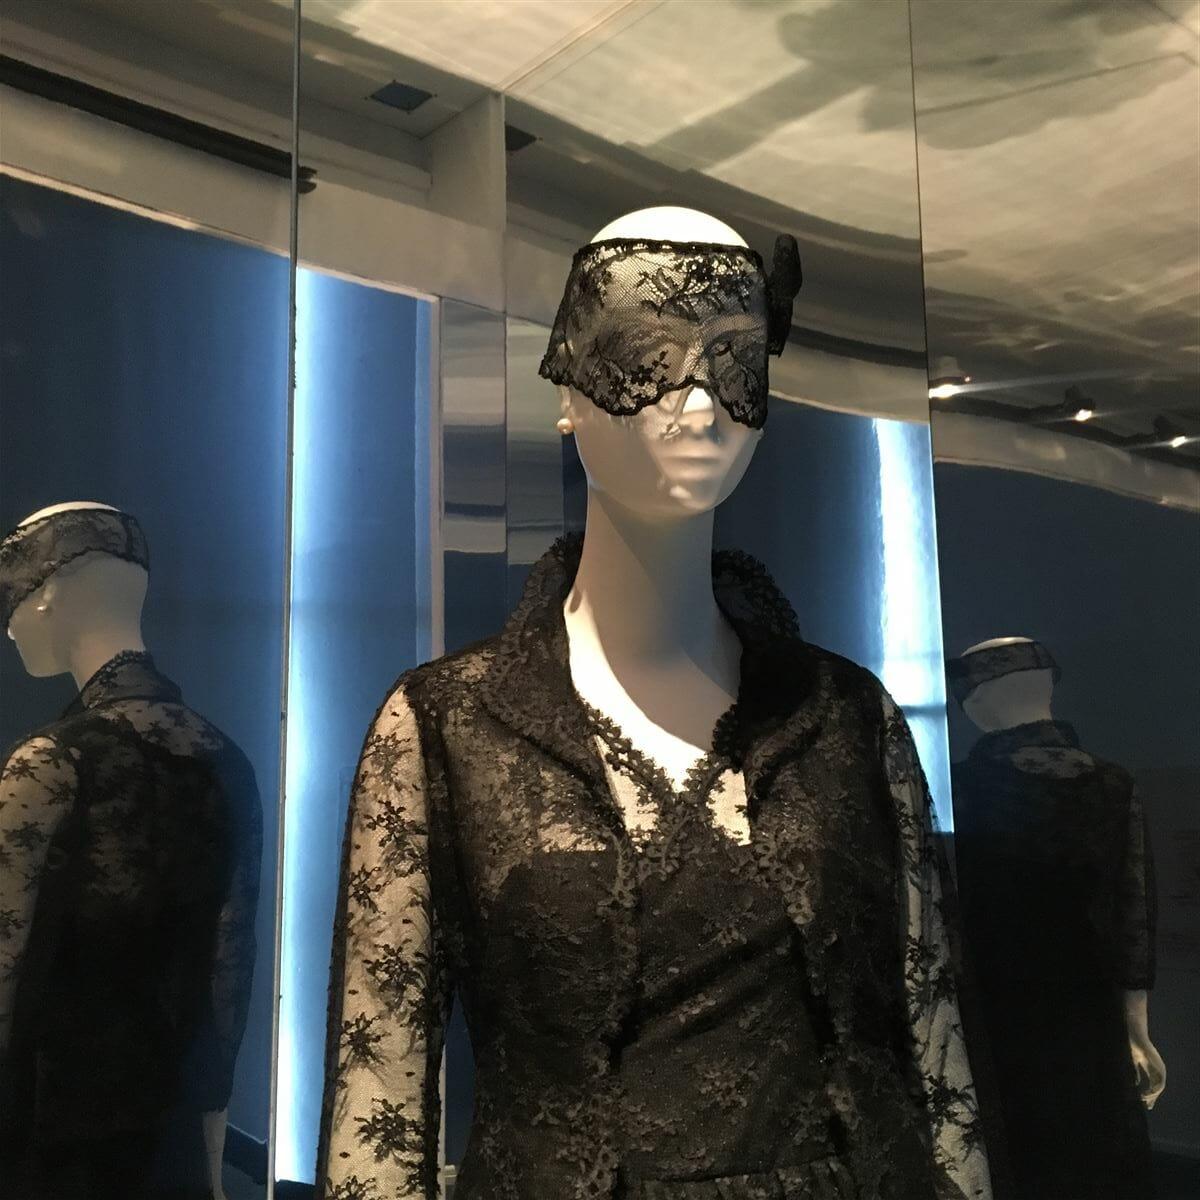 Die Spitze der Eleganz – Hubert de Givenchy in Calais   Mode-Spitze BLOG